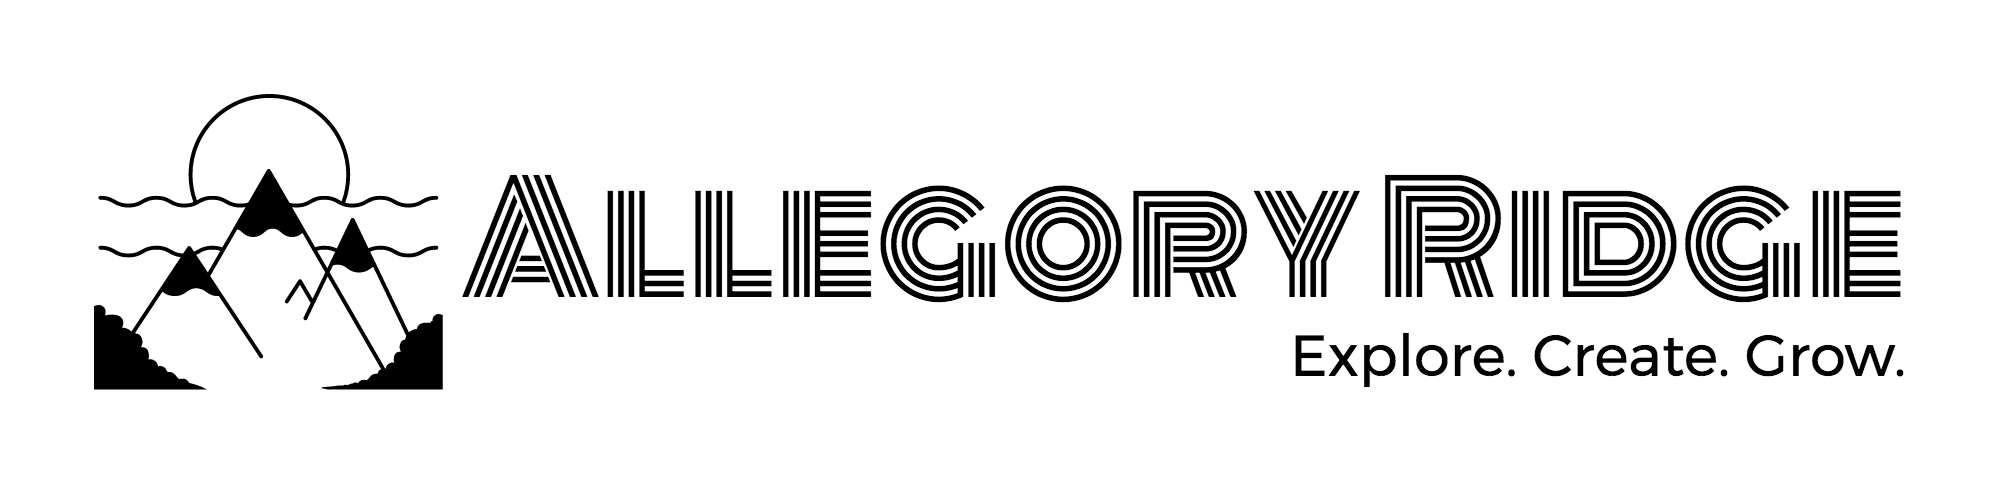 Allegory Ridge-logo-black.png